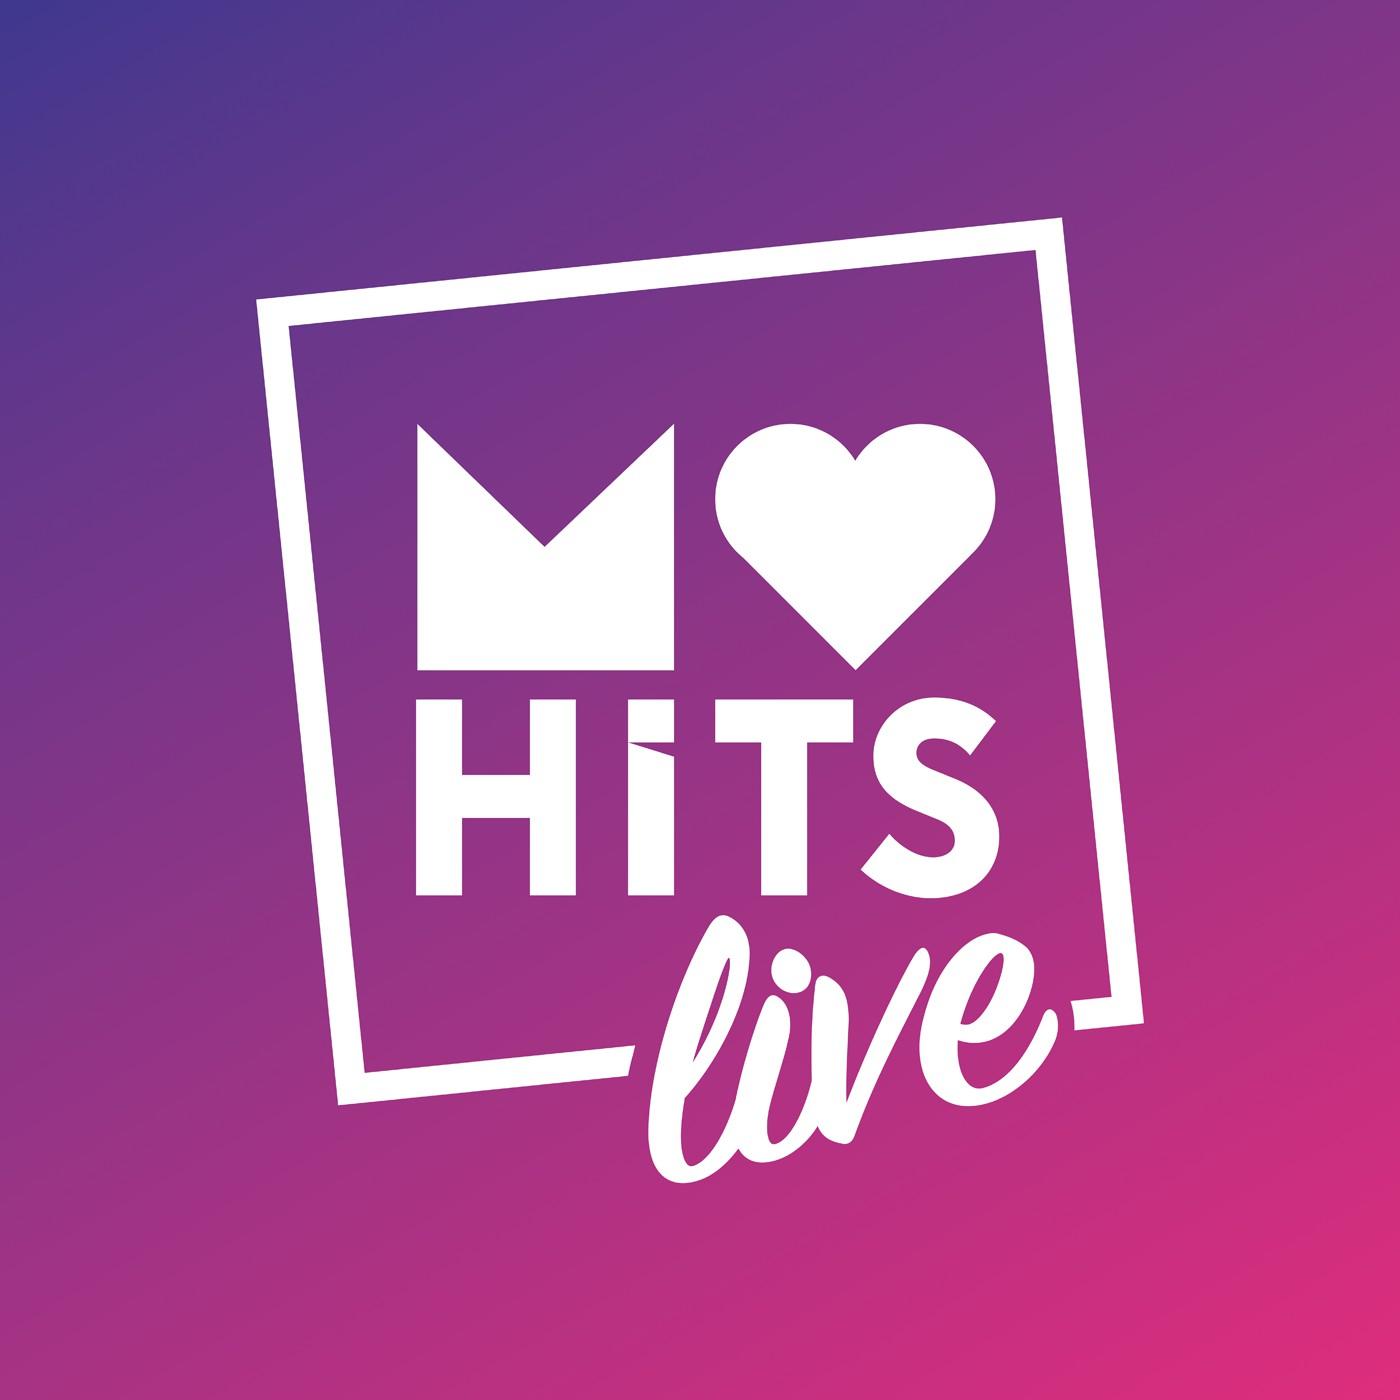 MyHits Live: Jaagup Tuisk – Las mängib ta